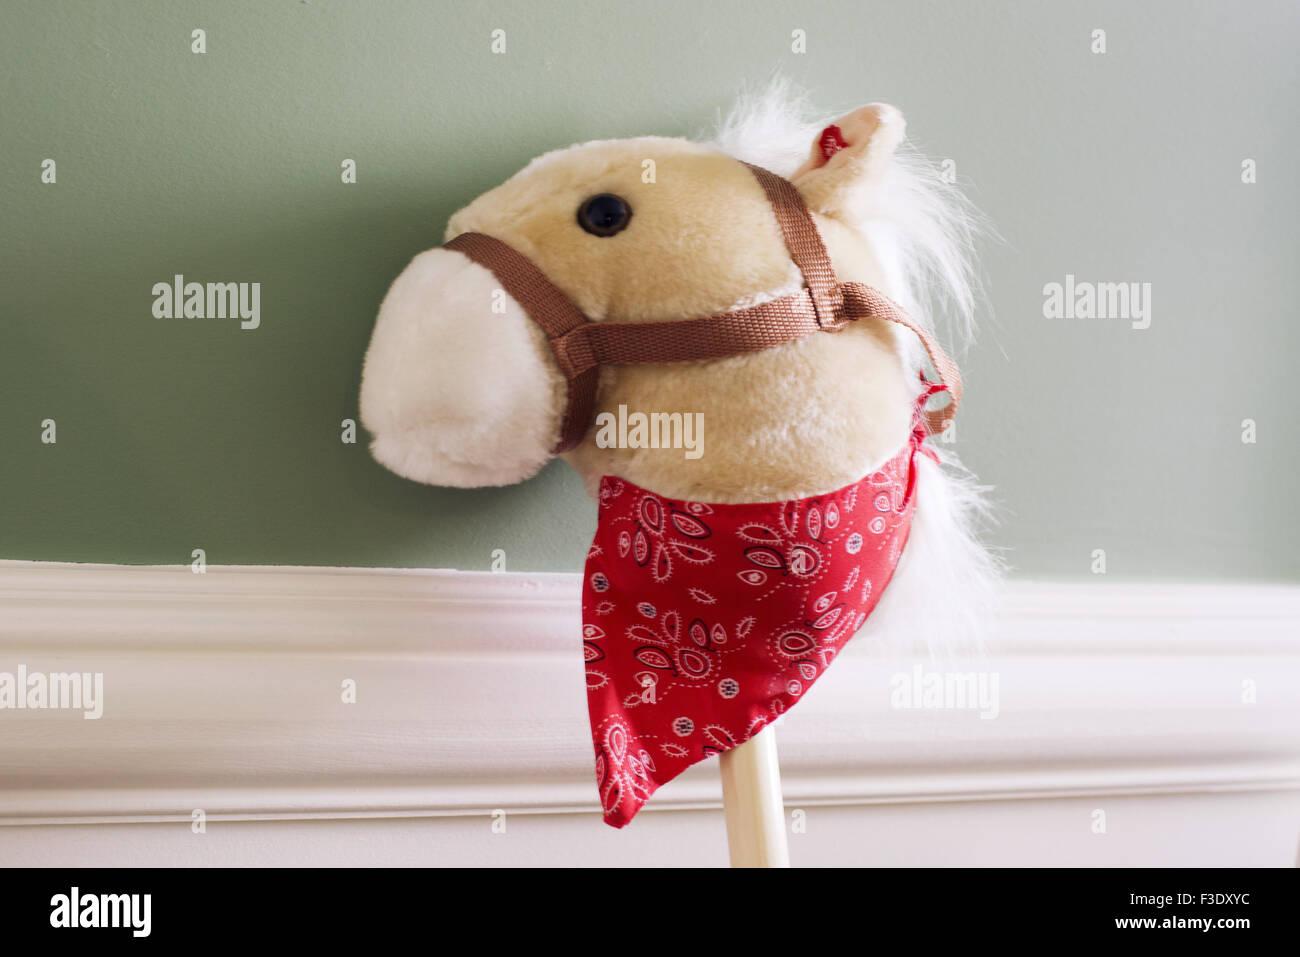 Child's toy hobby horse - Stock Image